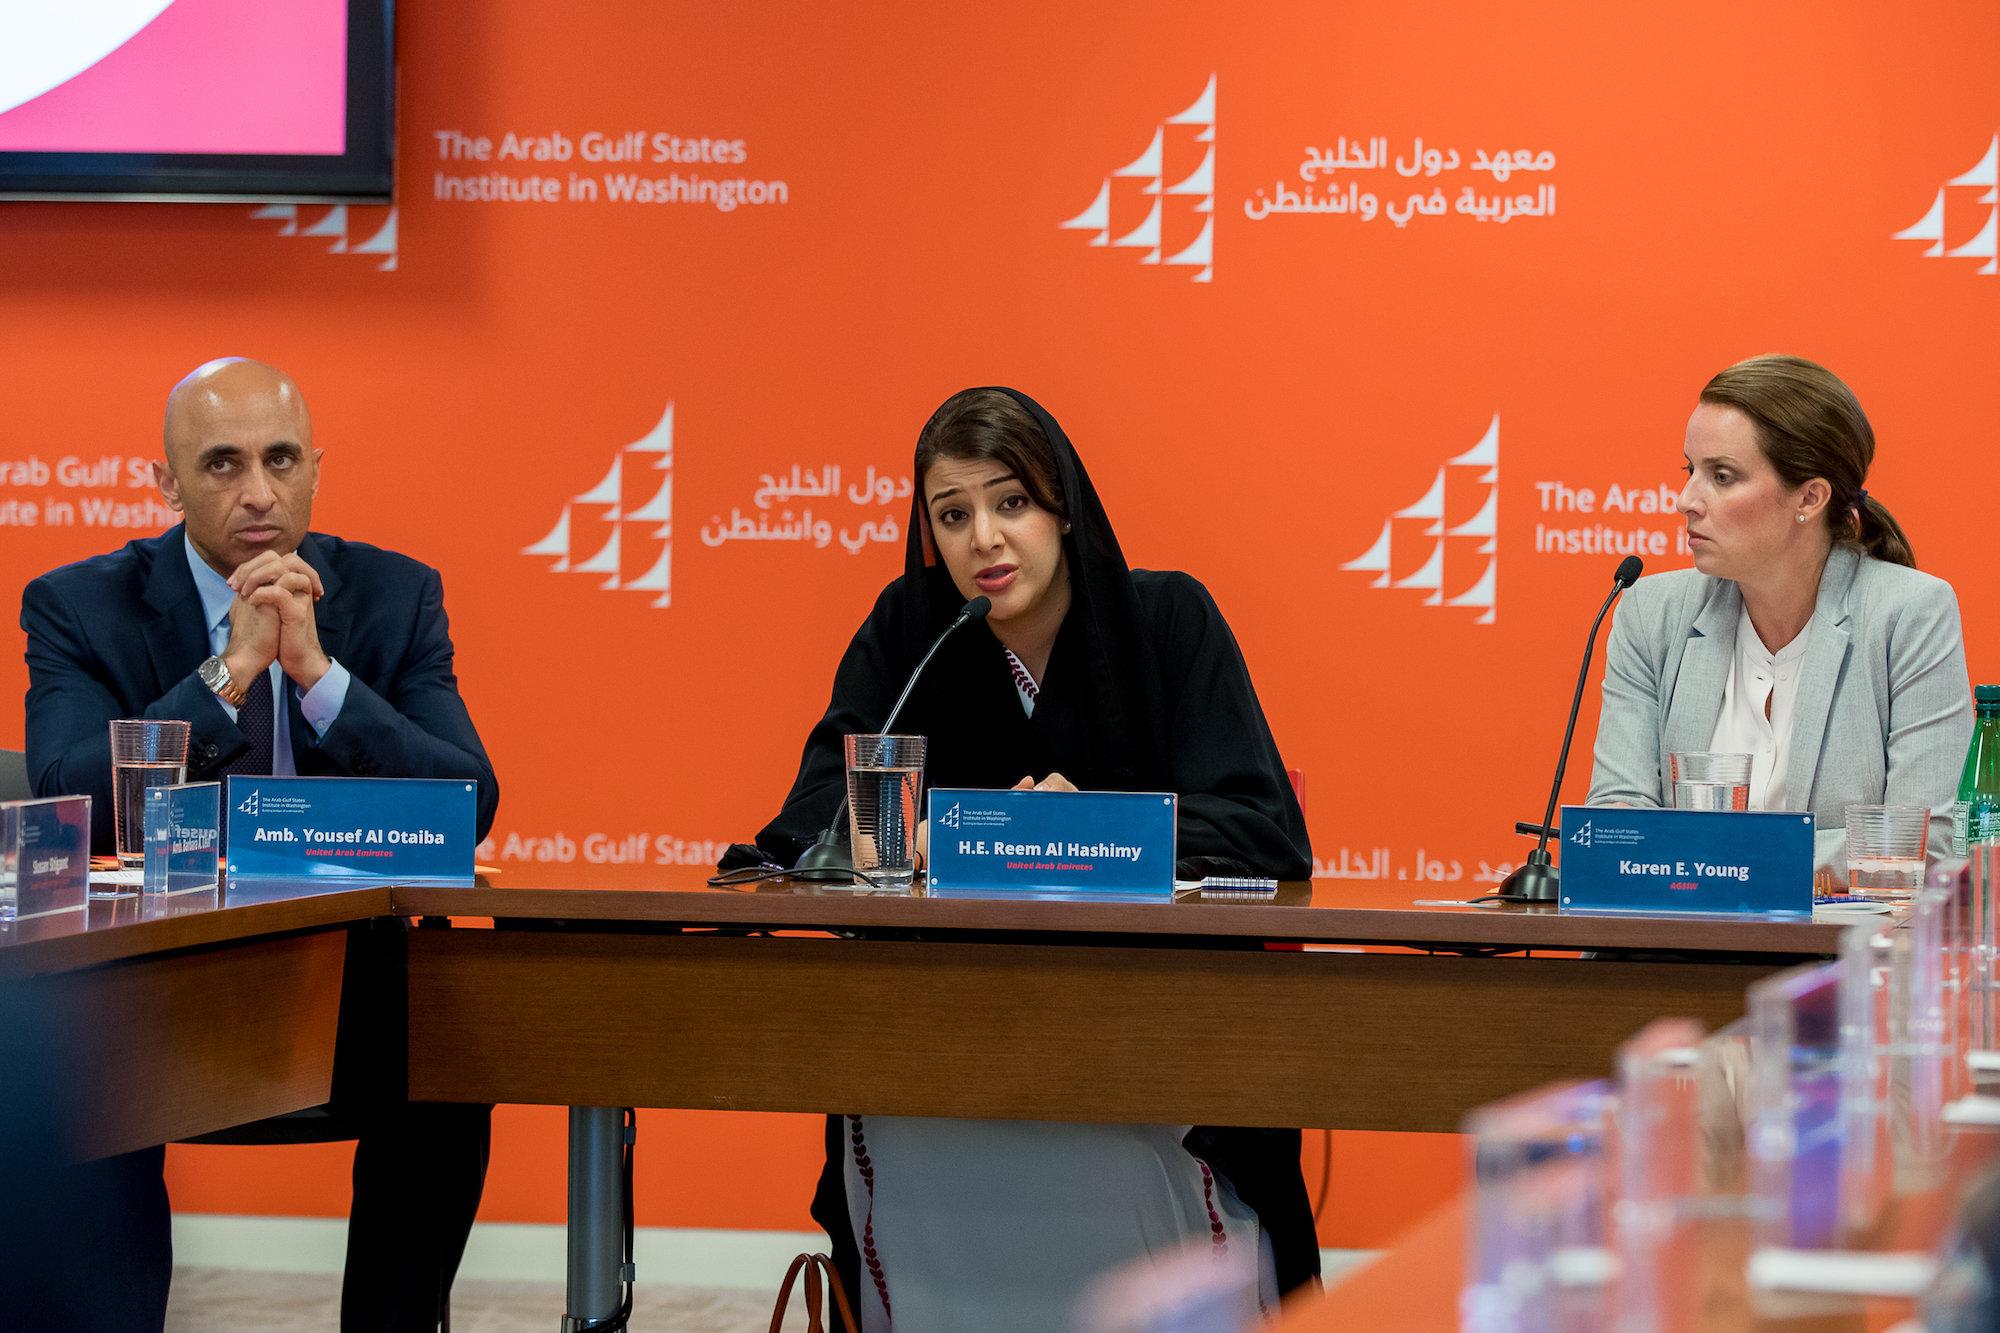 Yousef Al Otaiba, H.E. Reem Al Hashimy, Karen E. Young